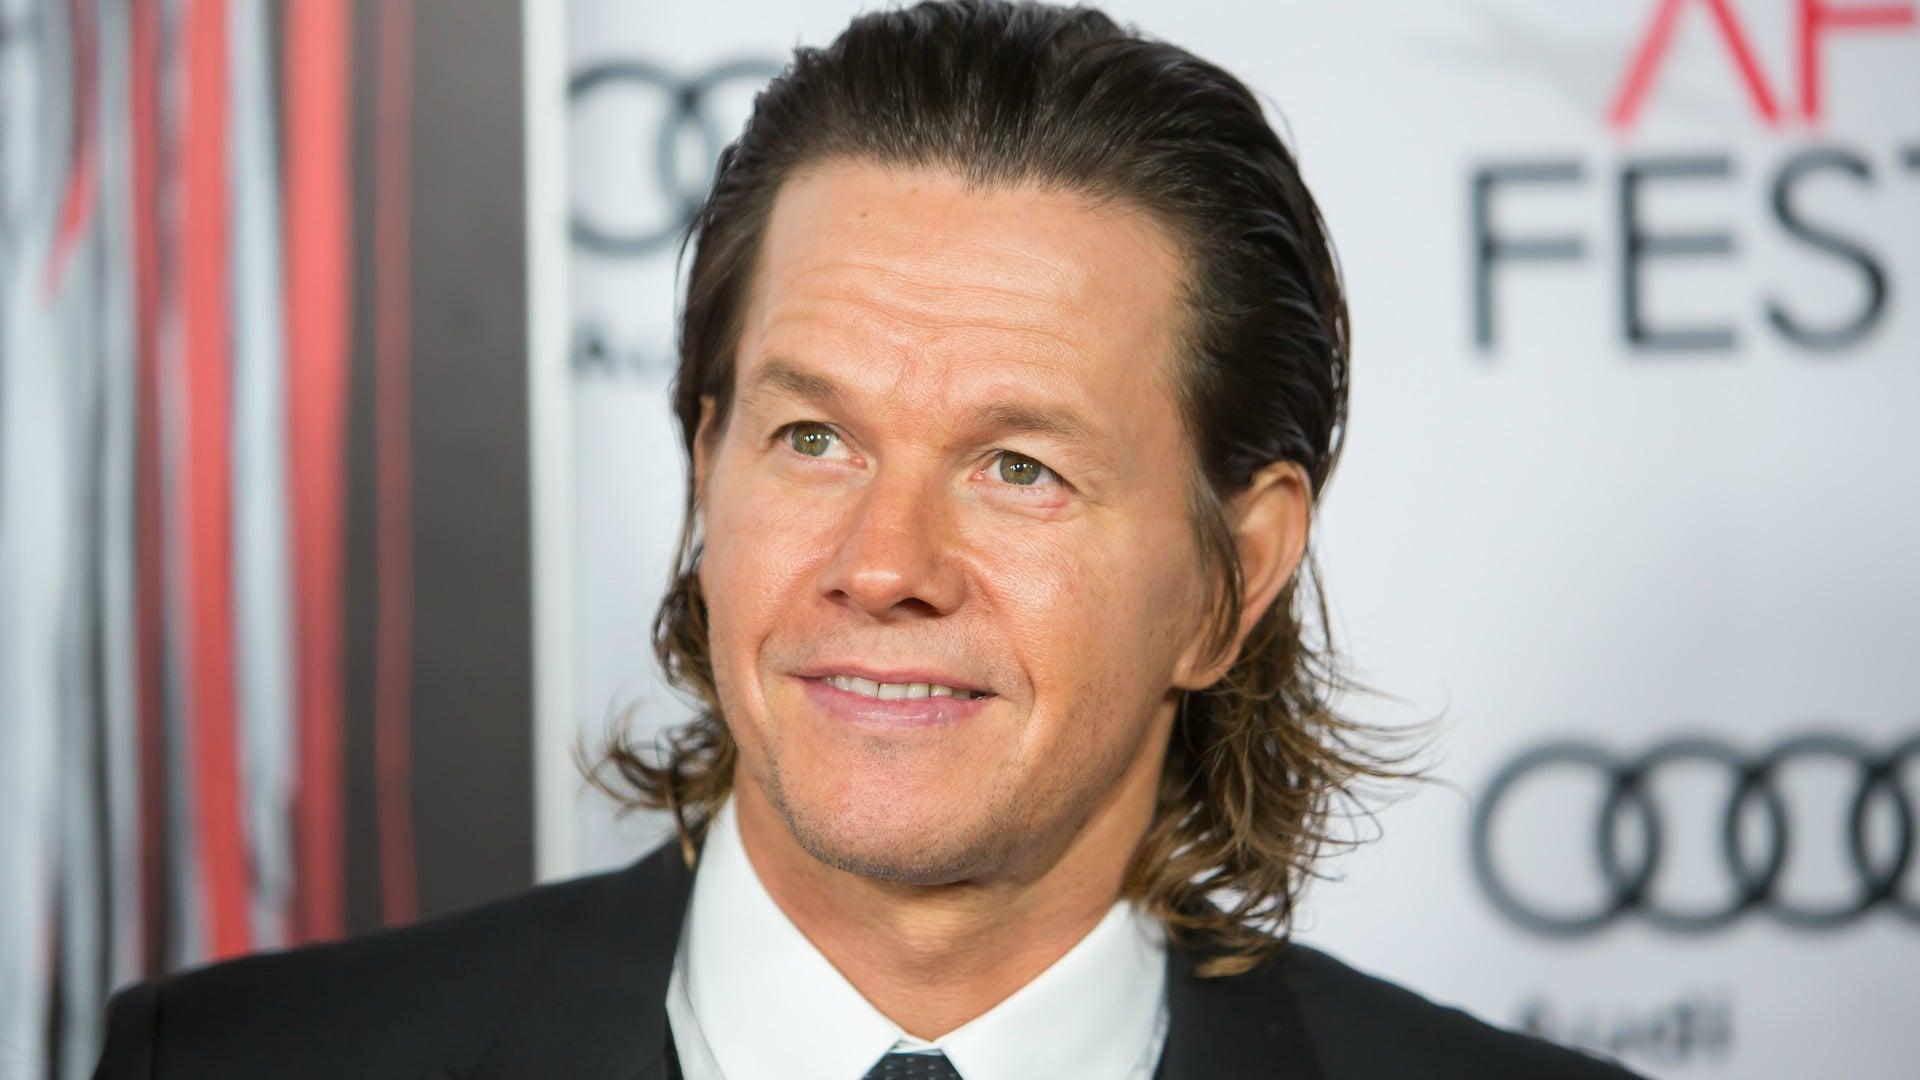 Forbes. 2017թ. աշխարհի ամենաշատ վարձատրվող դերասանները